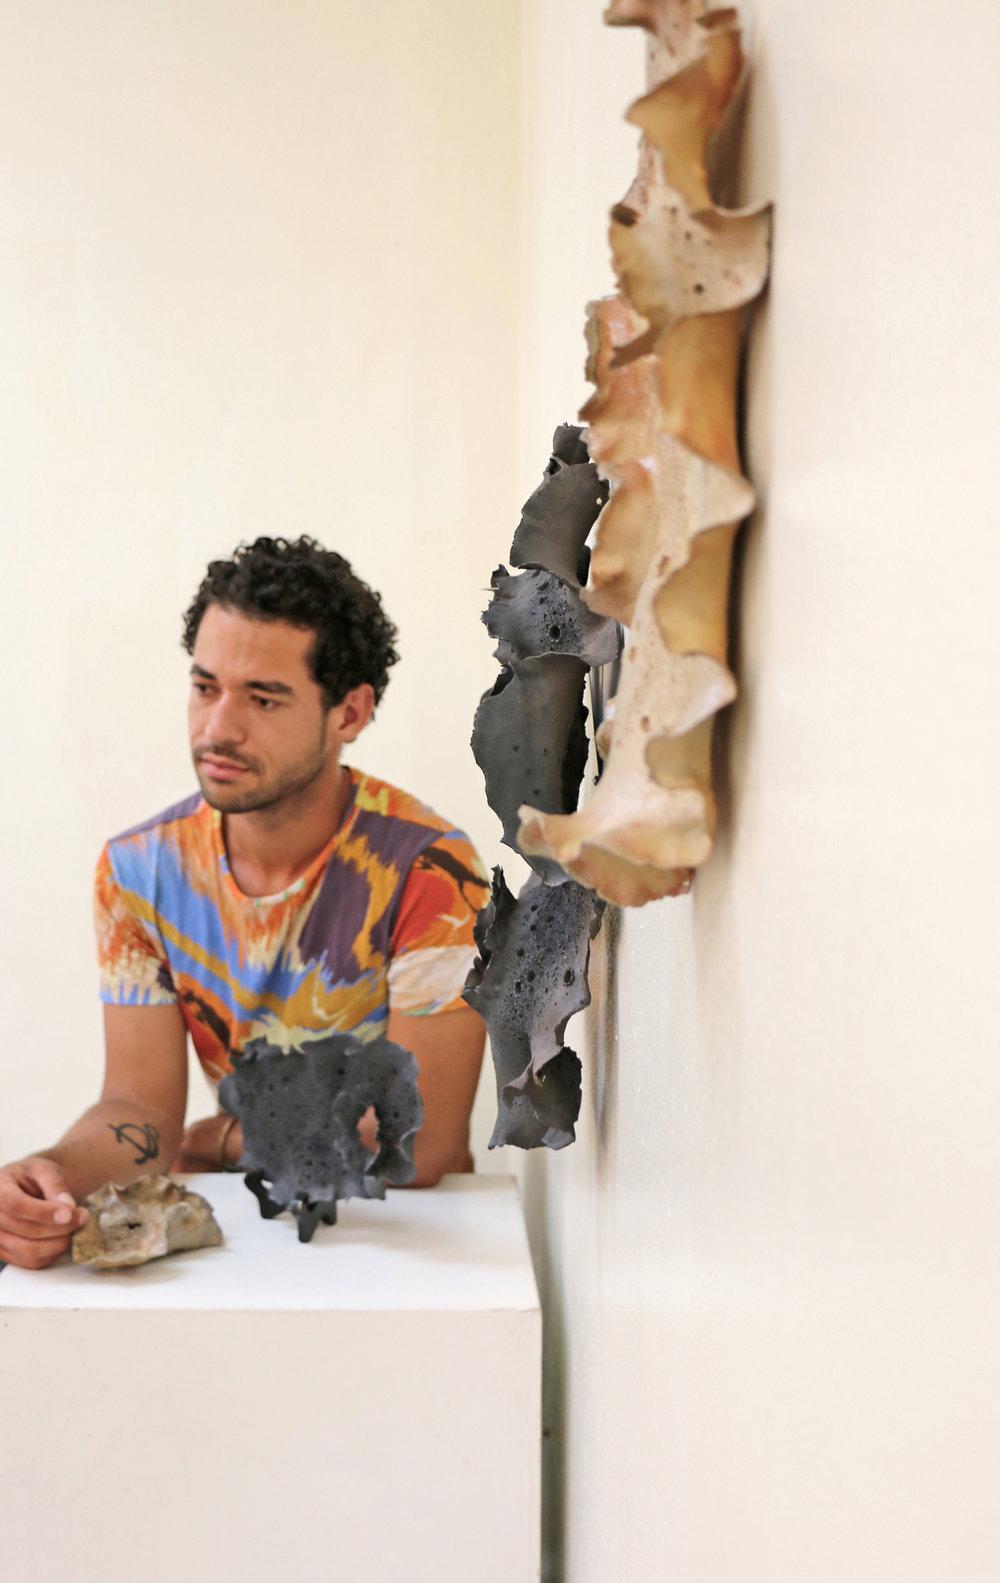 Bahamian ceramicist Alistair D. Stevenson with 'All of My Emotions'. Doongalik Studios, Nassau, Bahamas